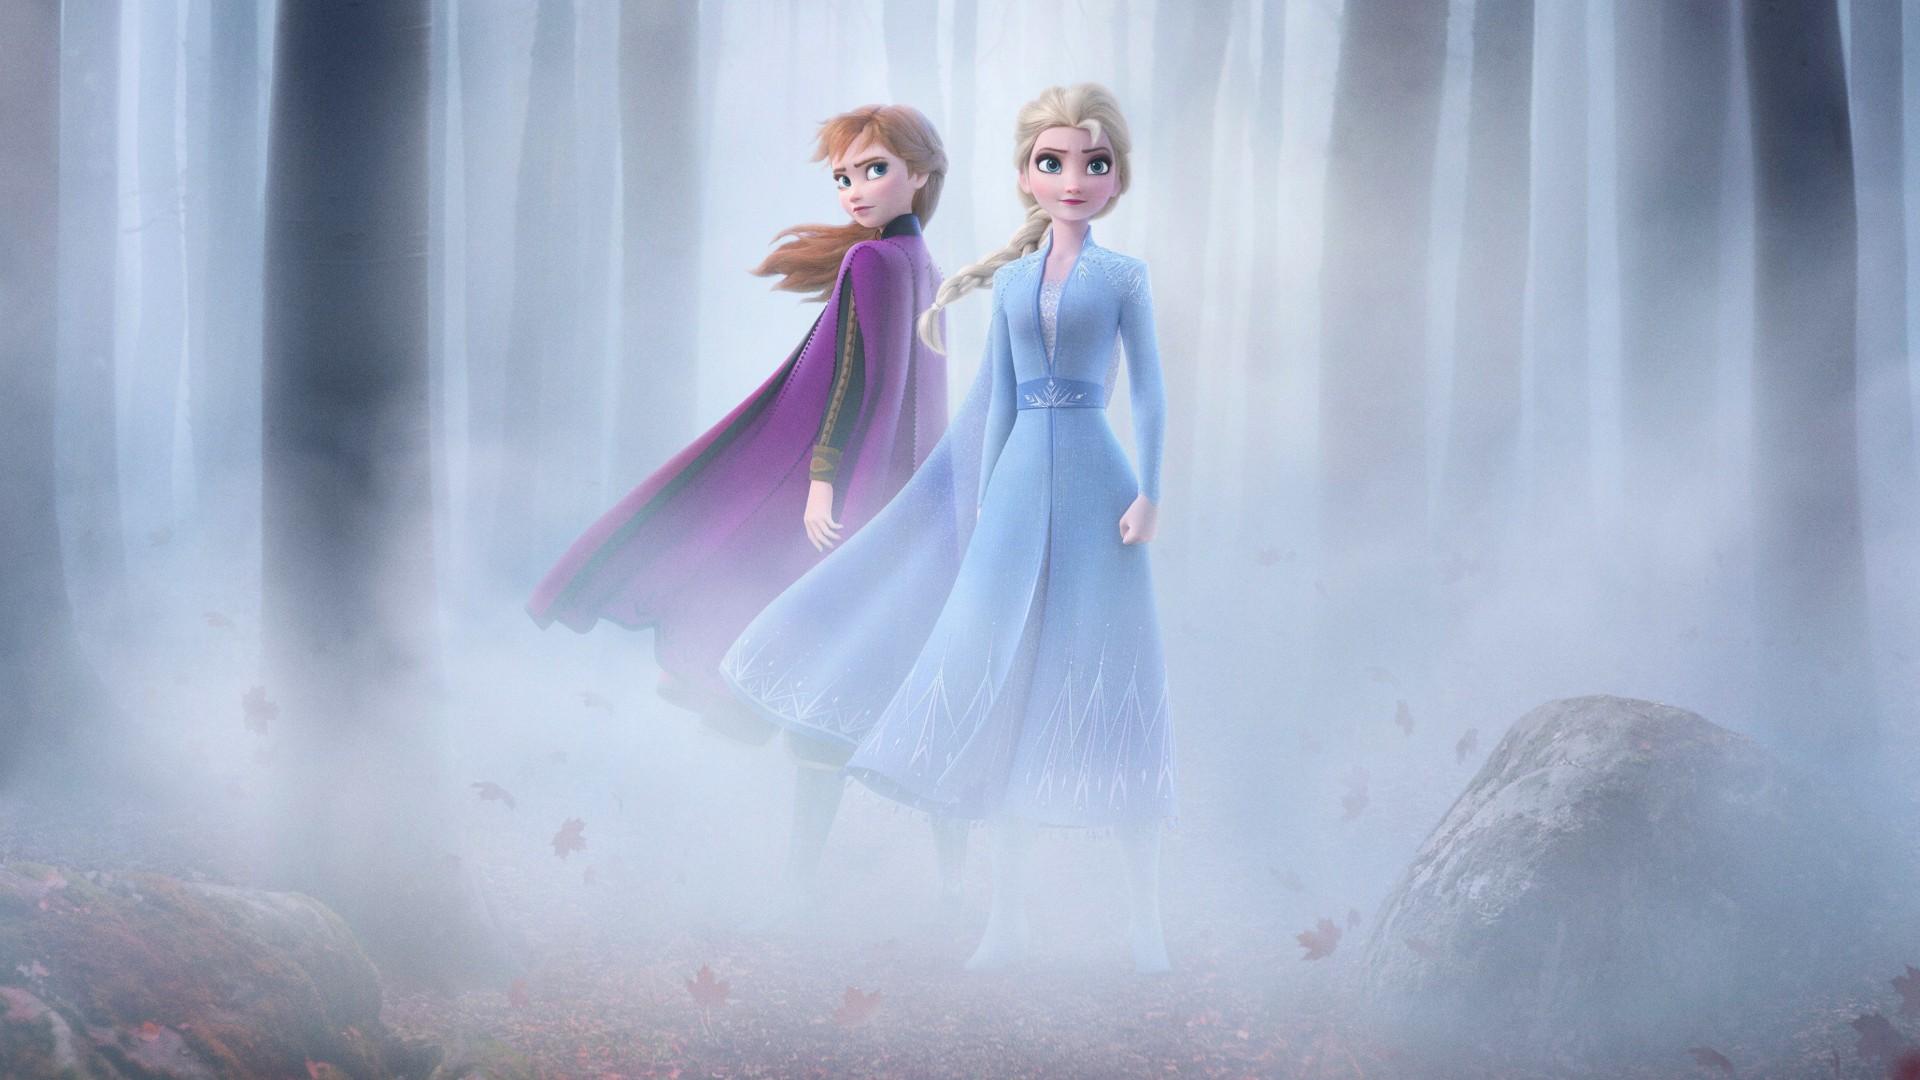 Iphone 5s Cute Wallpaper Hd Frozen 2 Elsa Amp Anna 4k Wallpapers Hd Wallpapers Id 28652